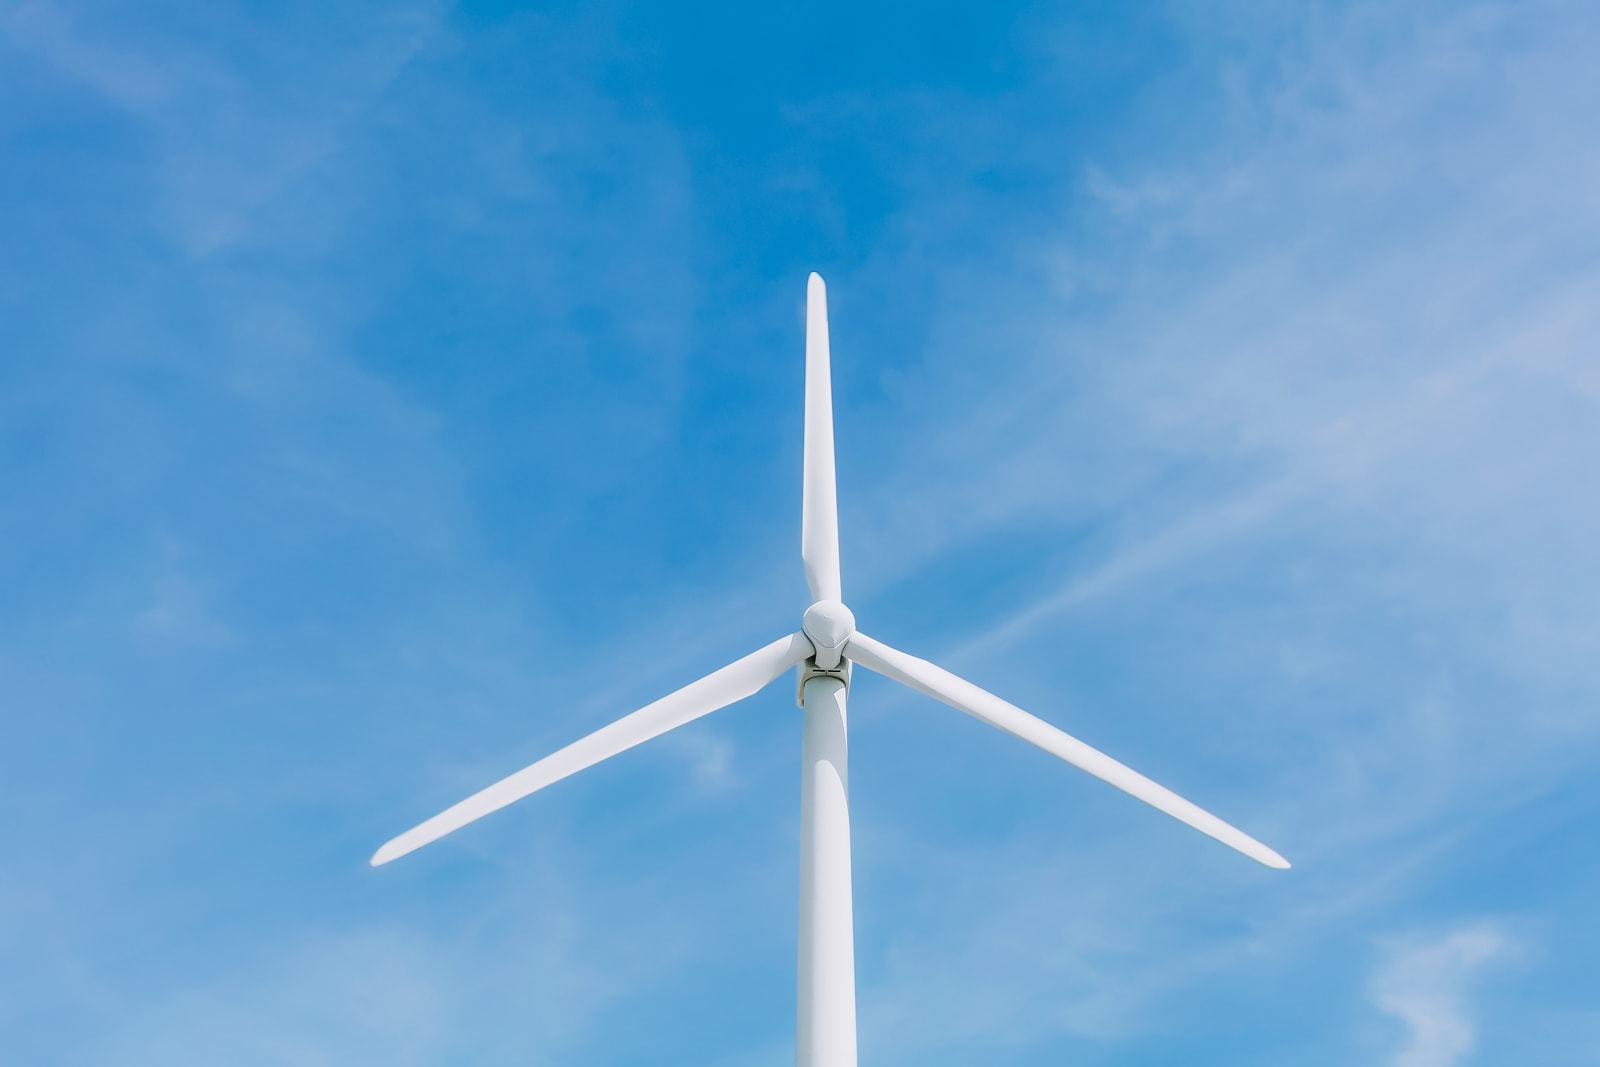 Wind Turbine close up at the Roscoe Wind Farm